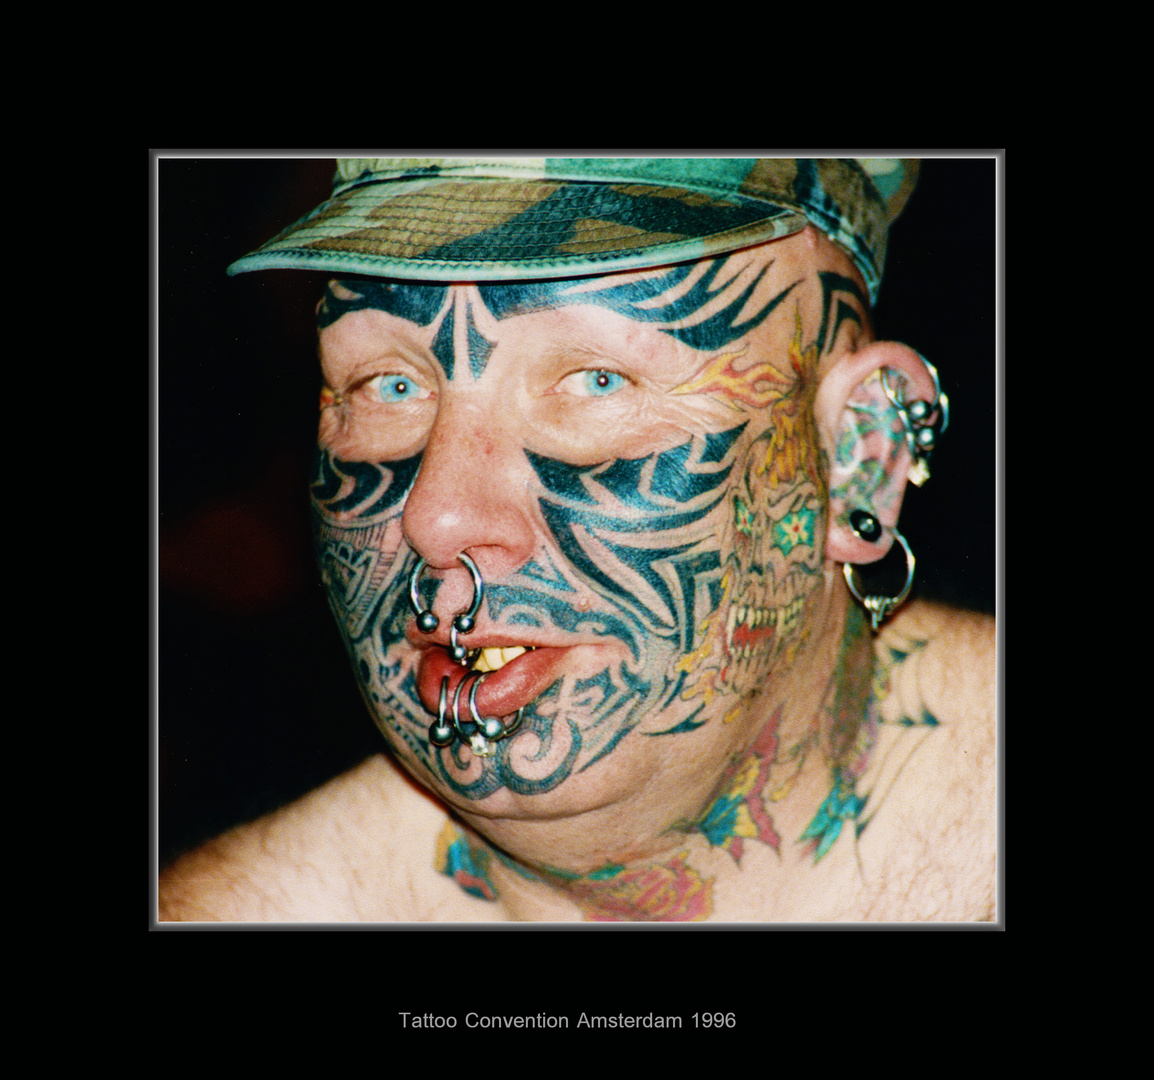 Tattoo Convention Amsterdam 1996